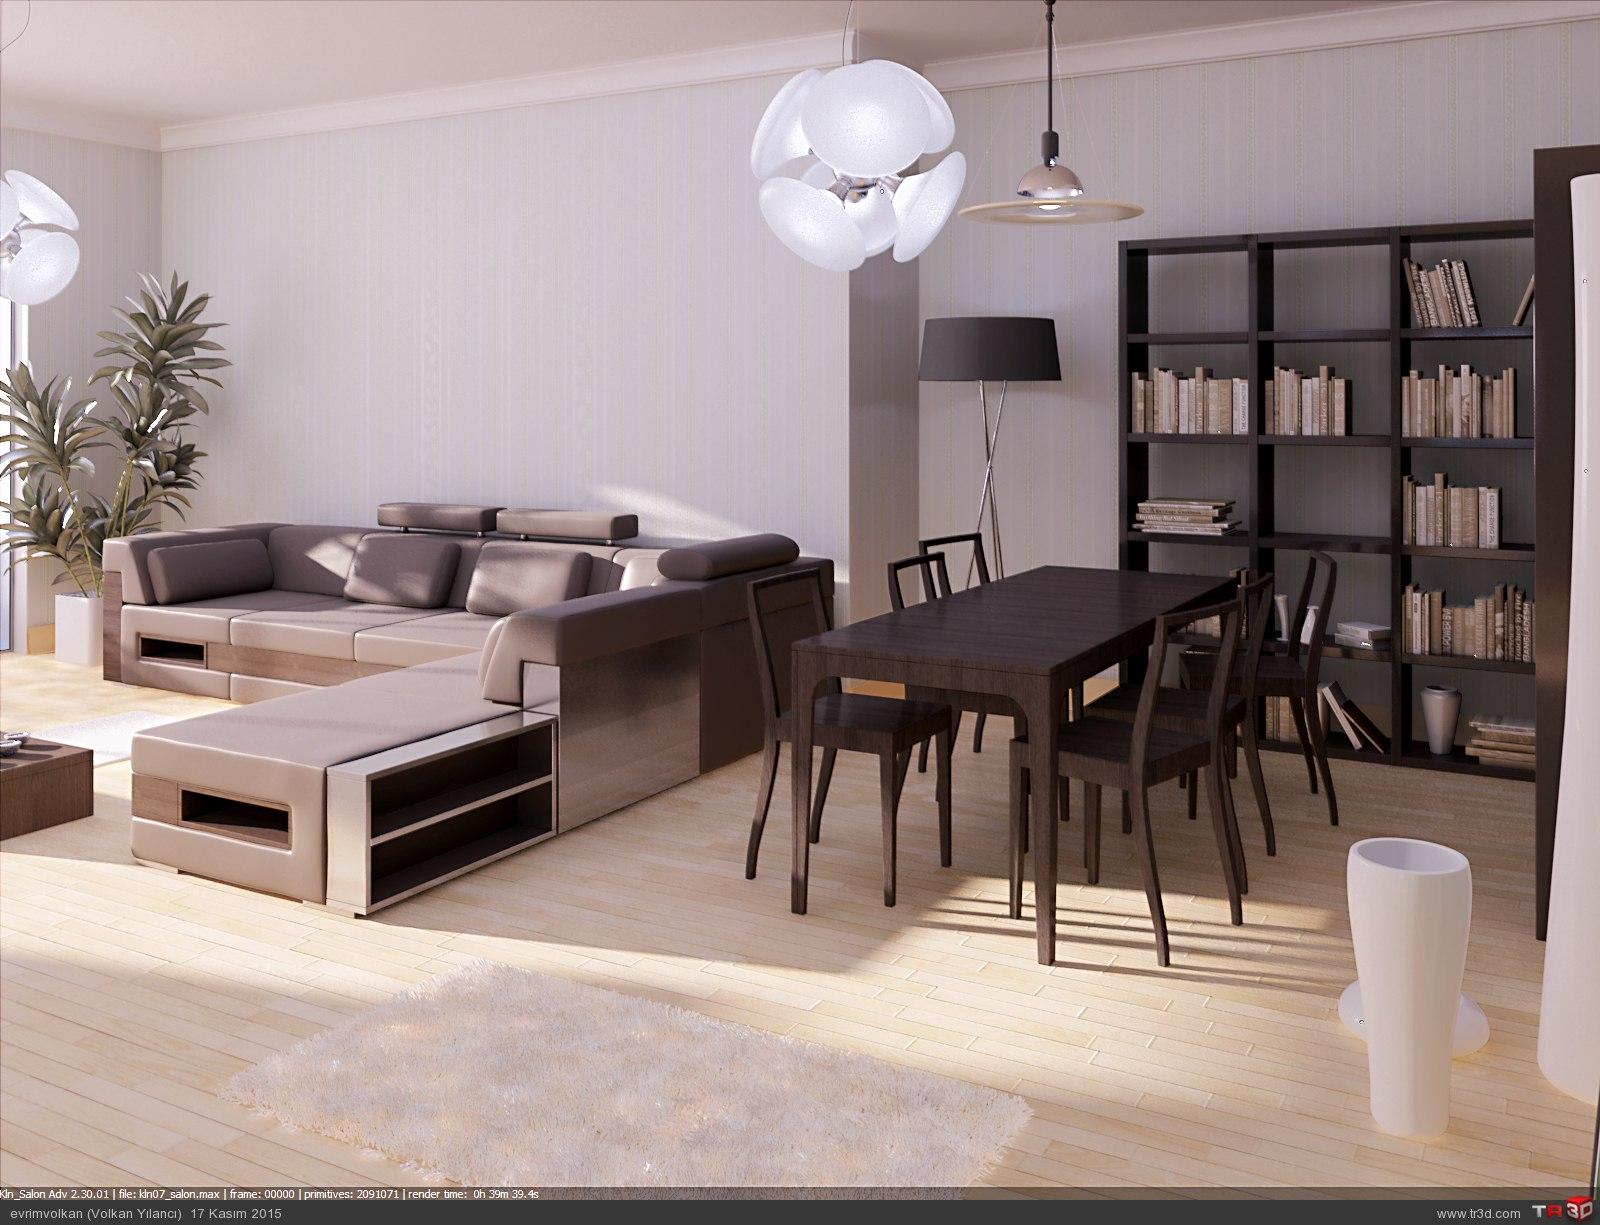 Örnek daire  4